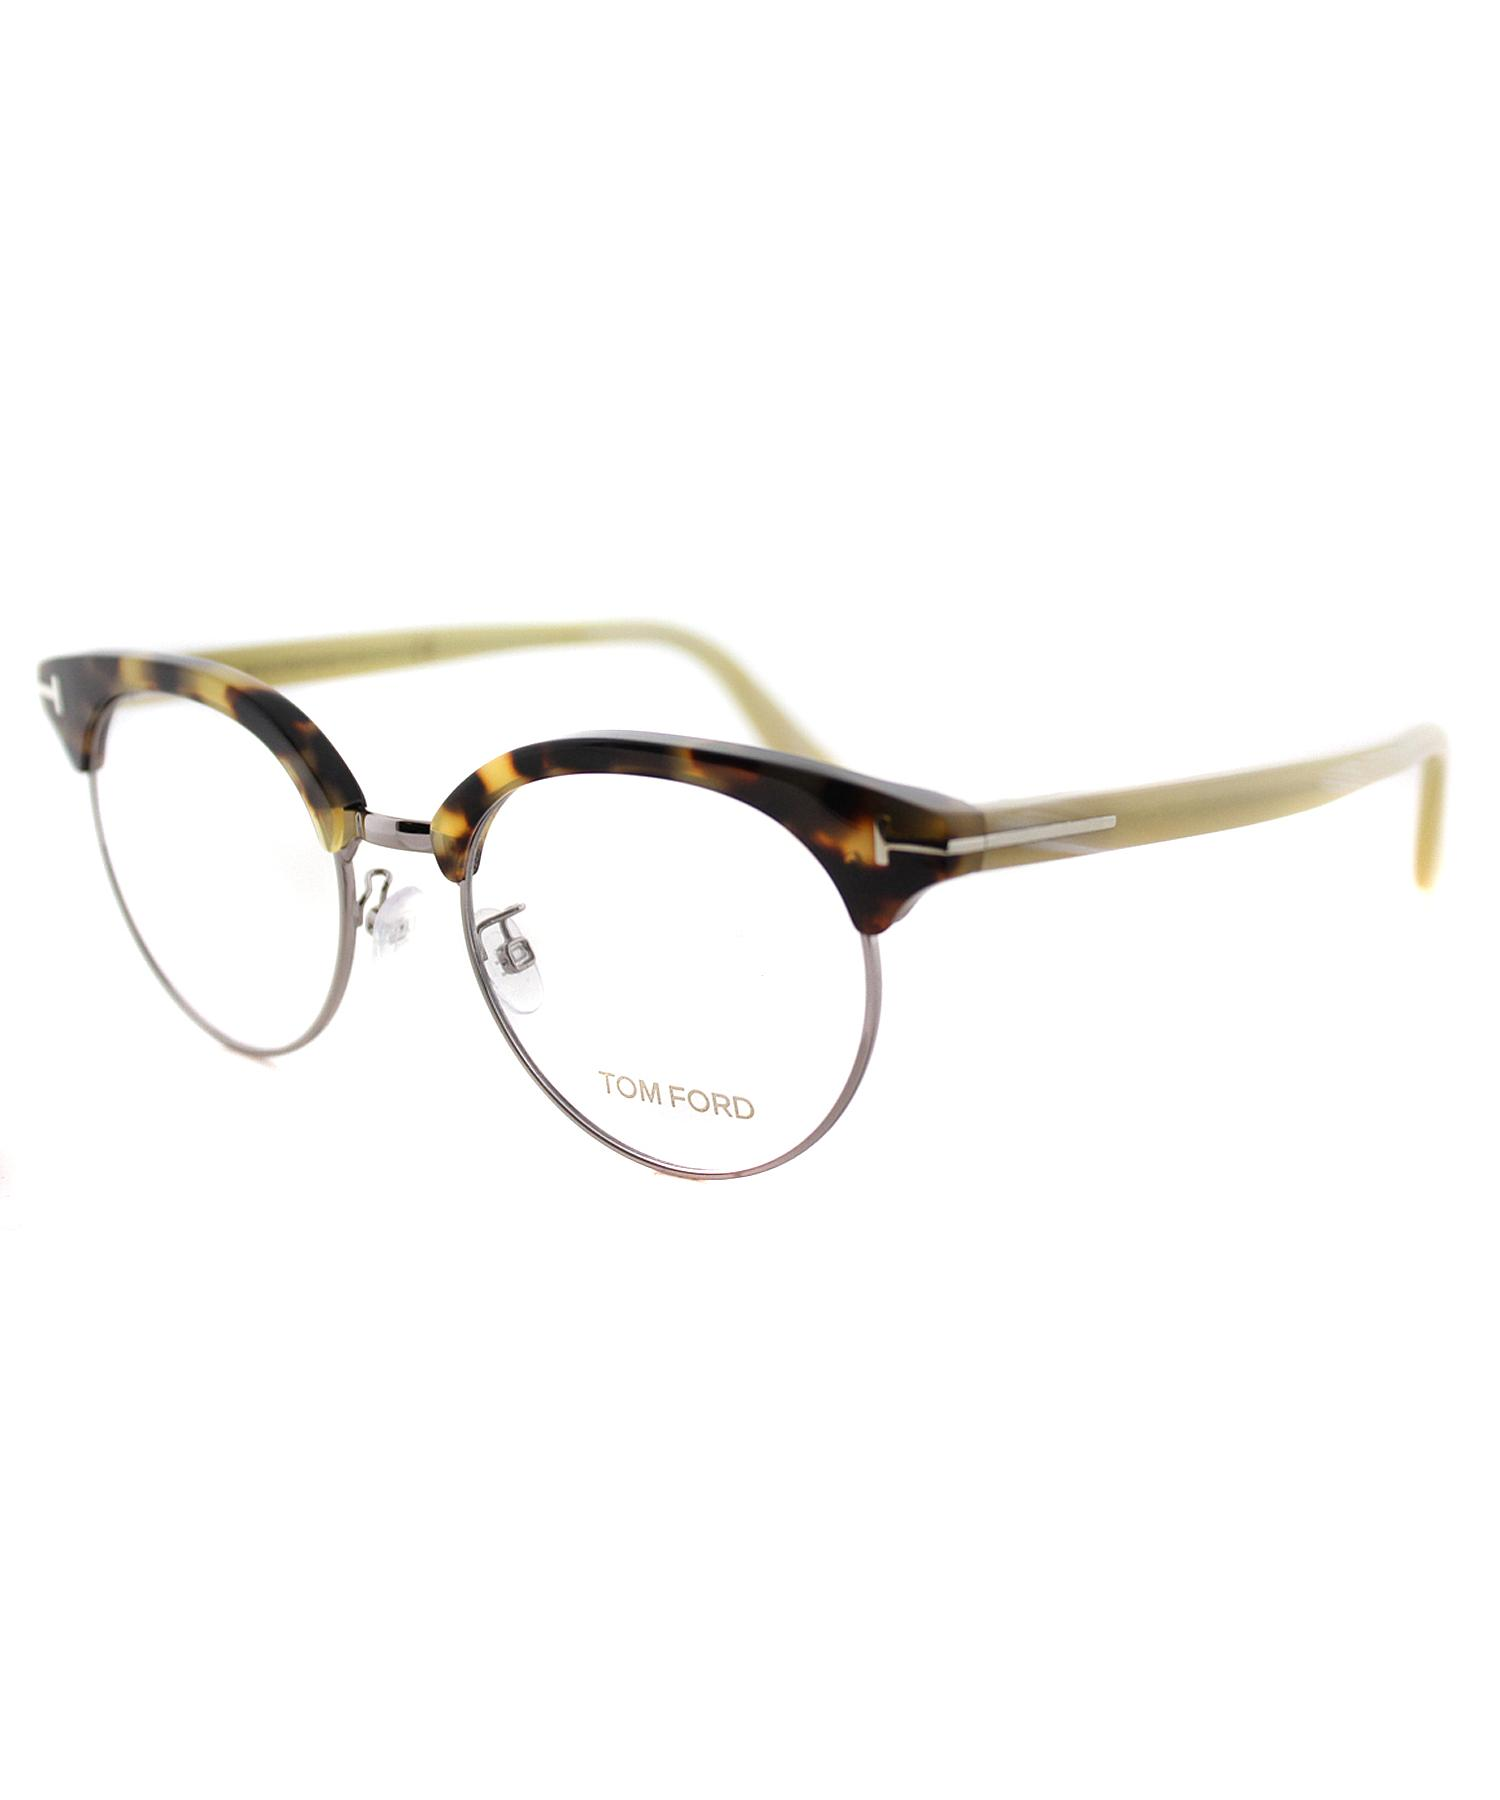 7ada90bf475 Lyst - Tom Ford Round Plastic Eyeglasses